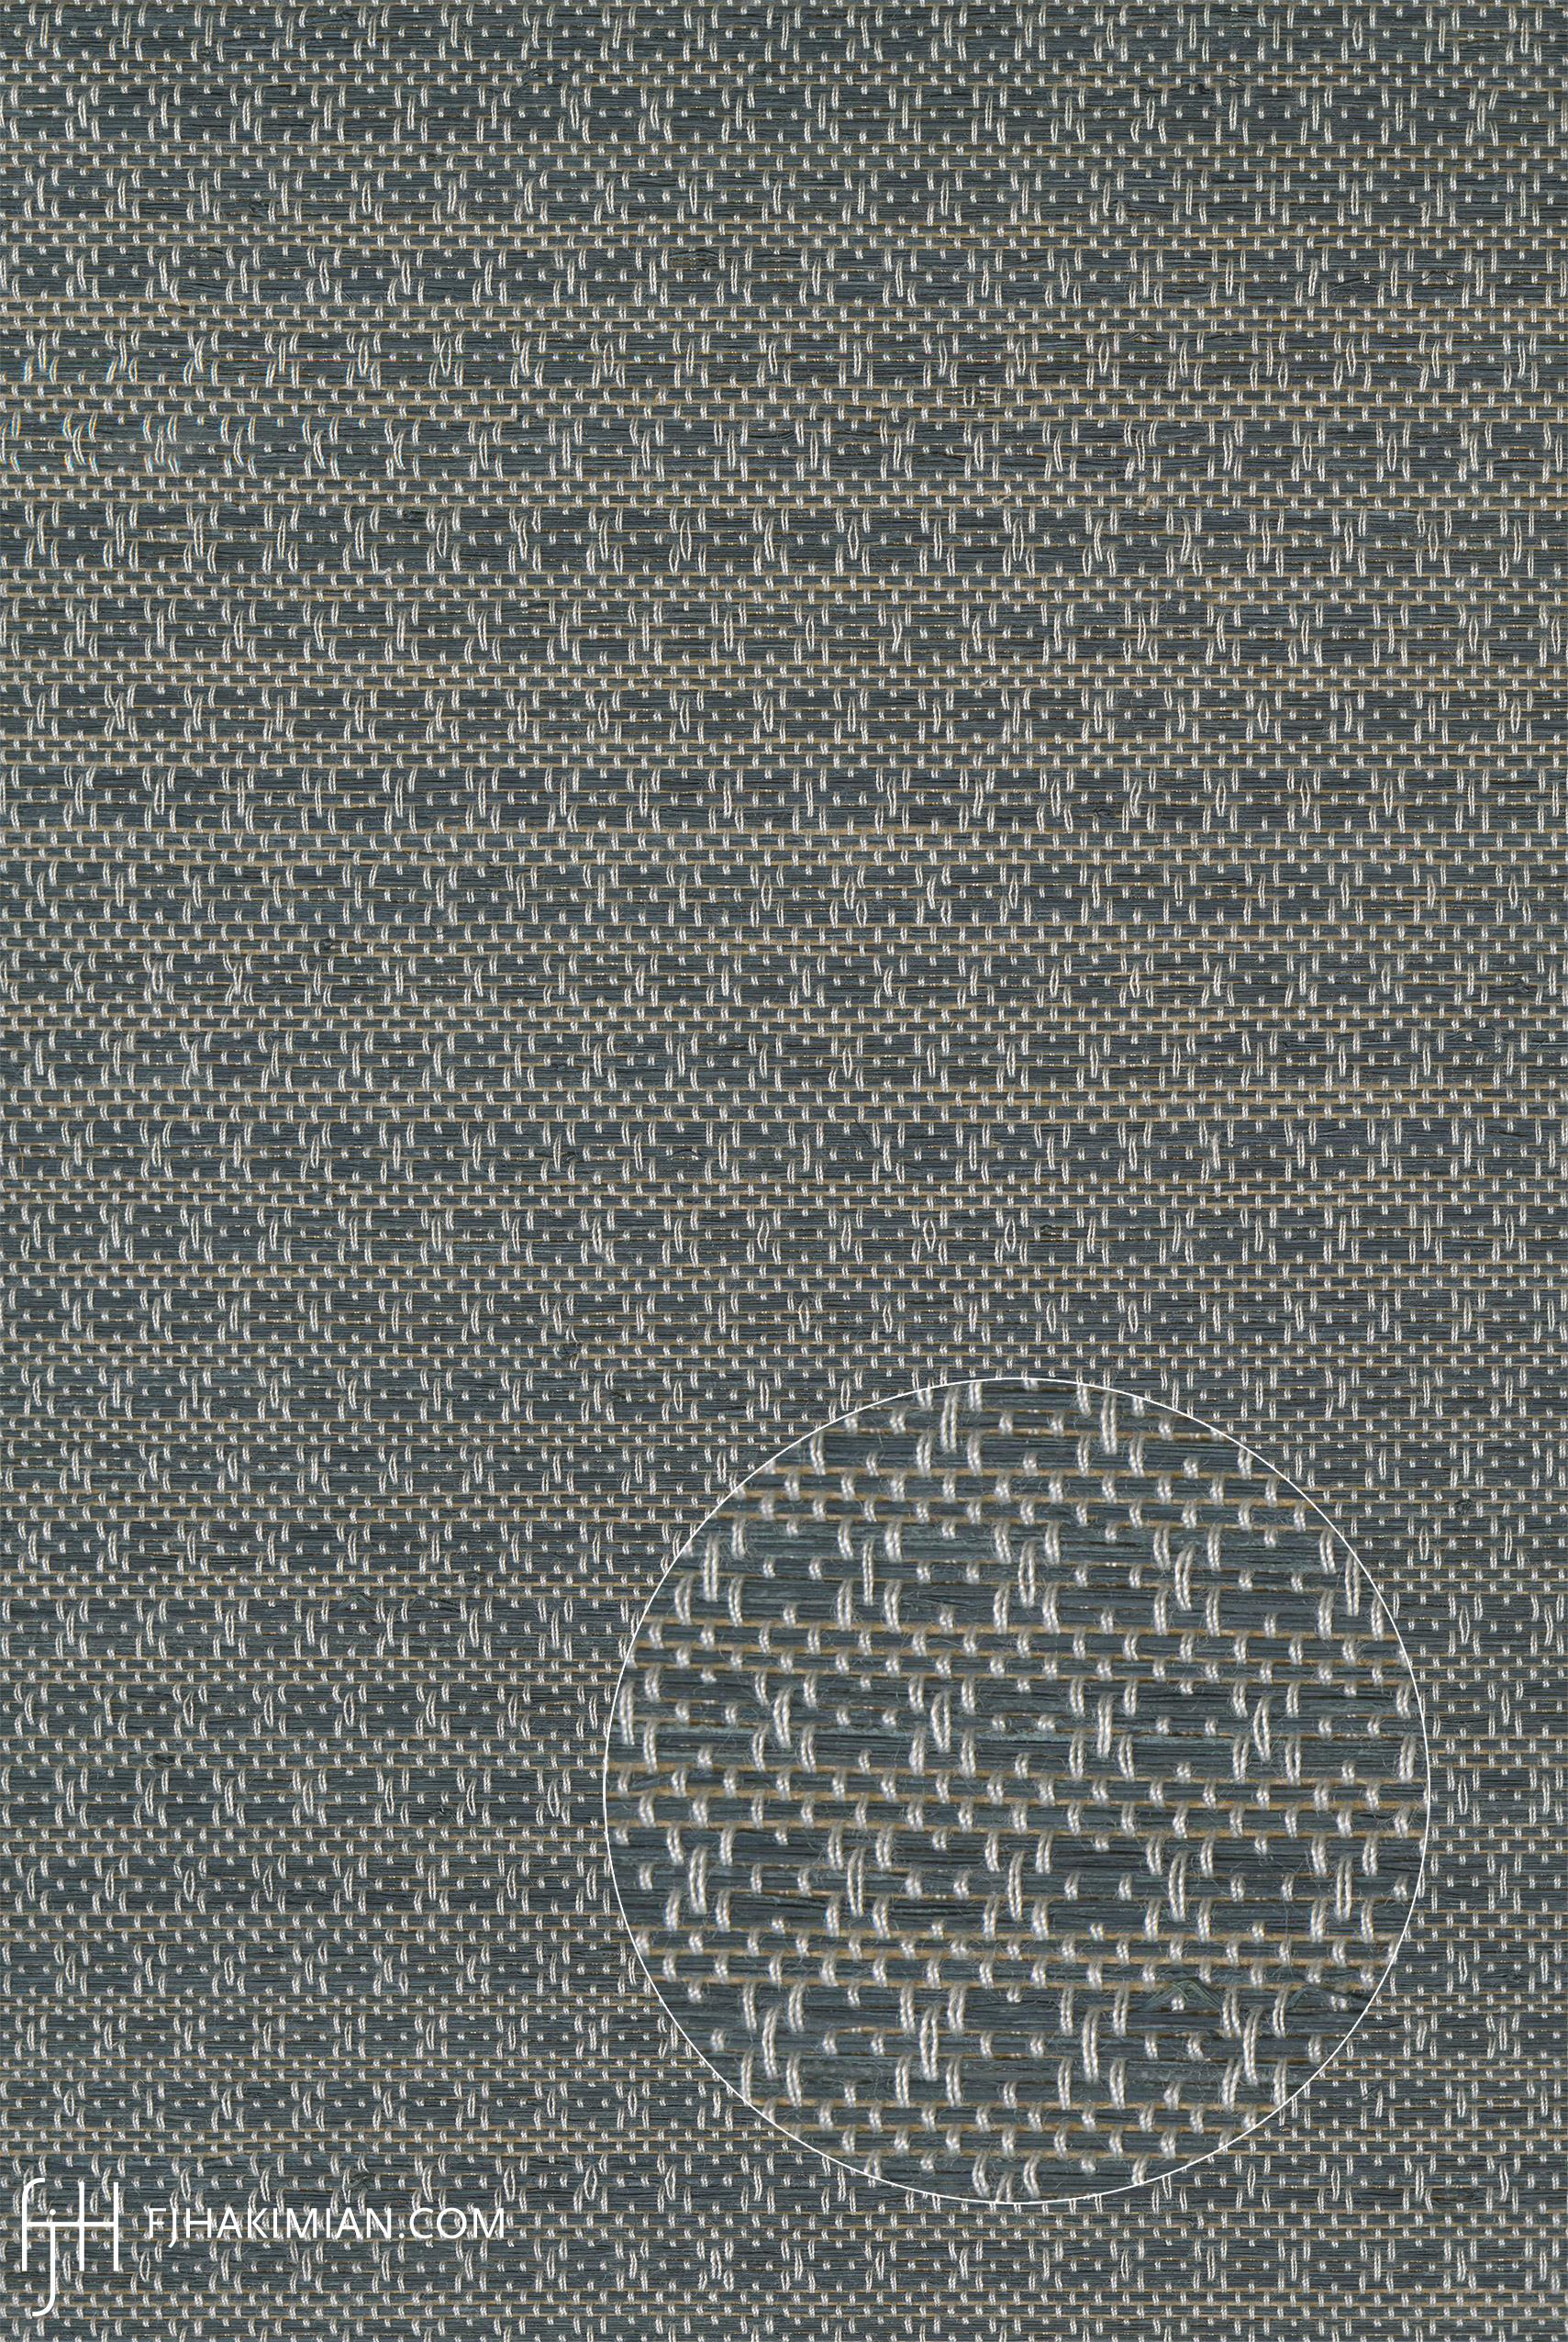 FJ Hakimian | SI-A-11 | Custom wall covering